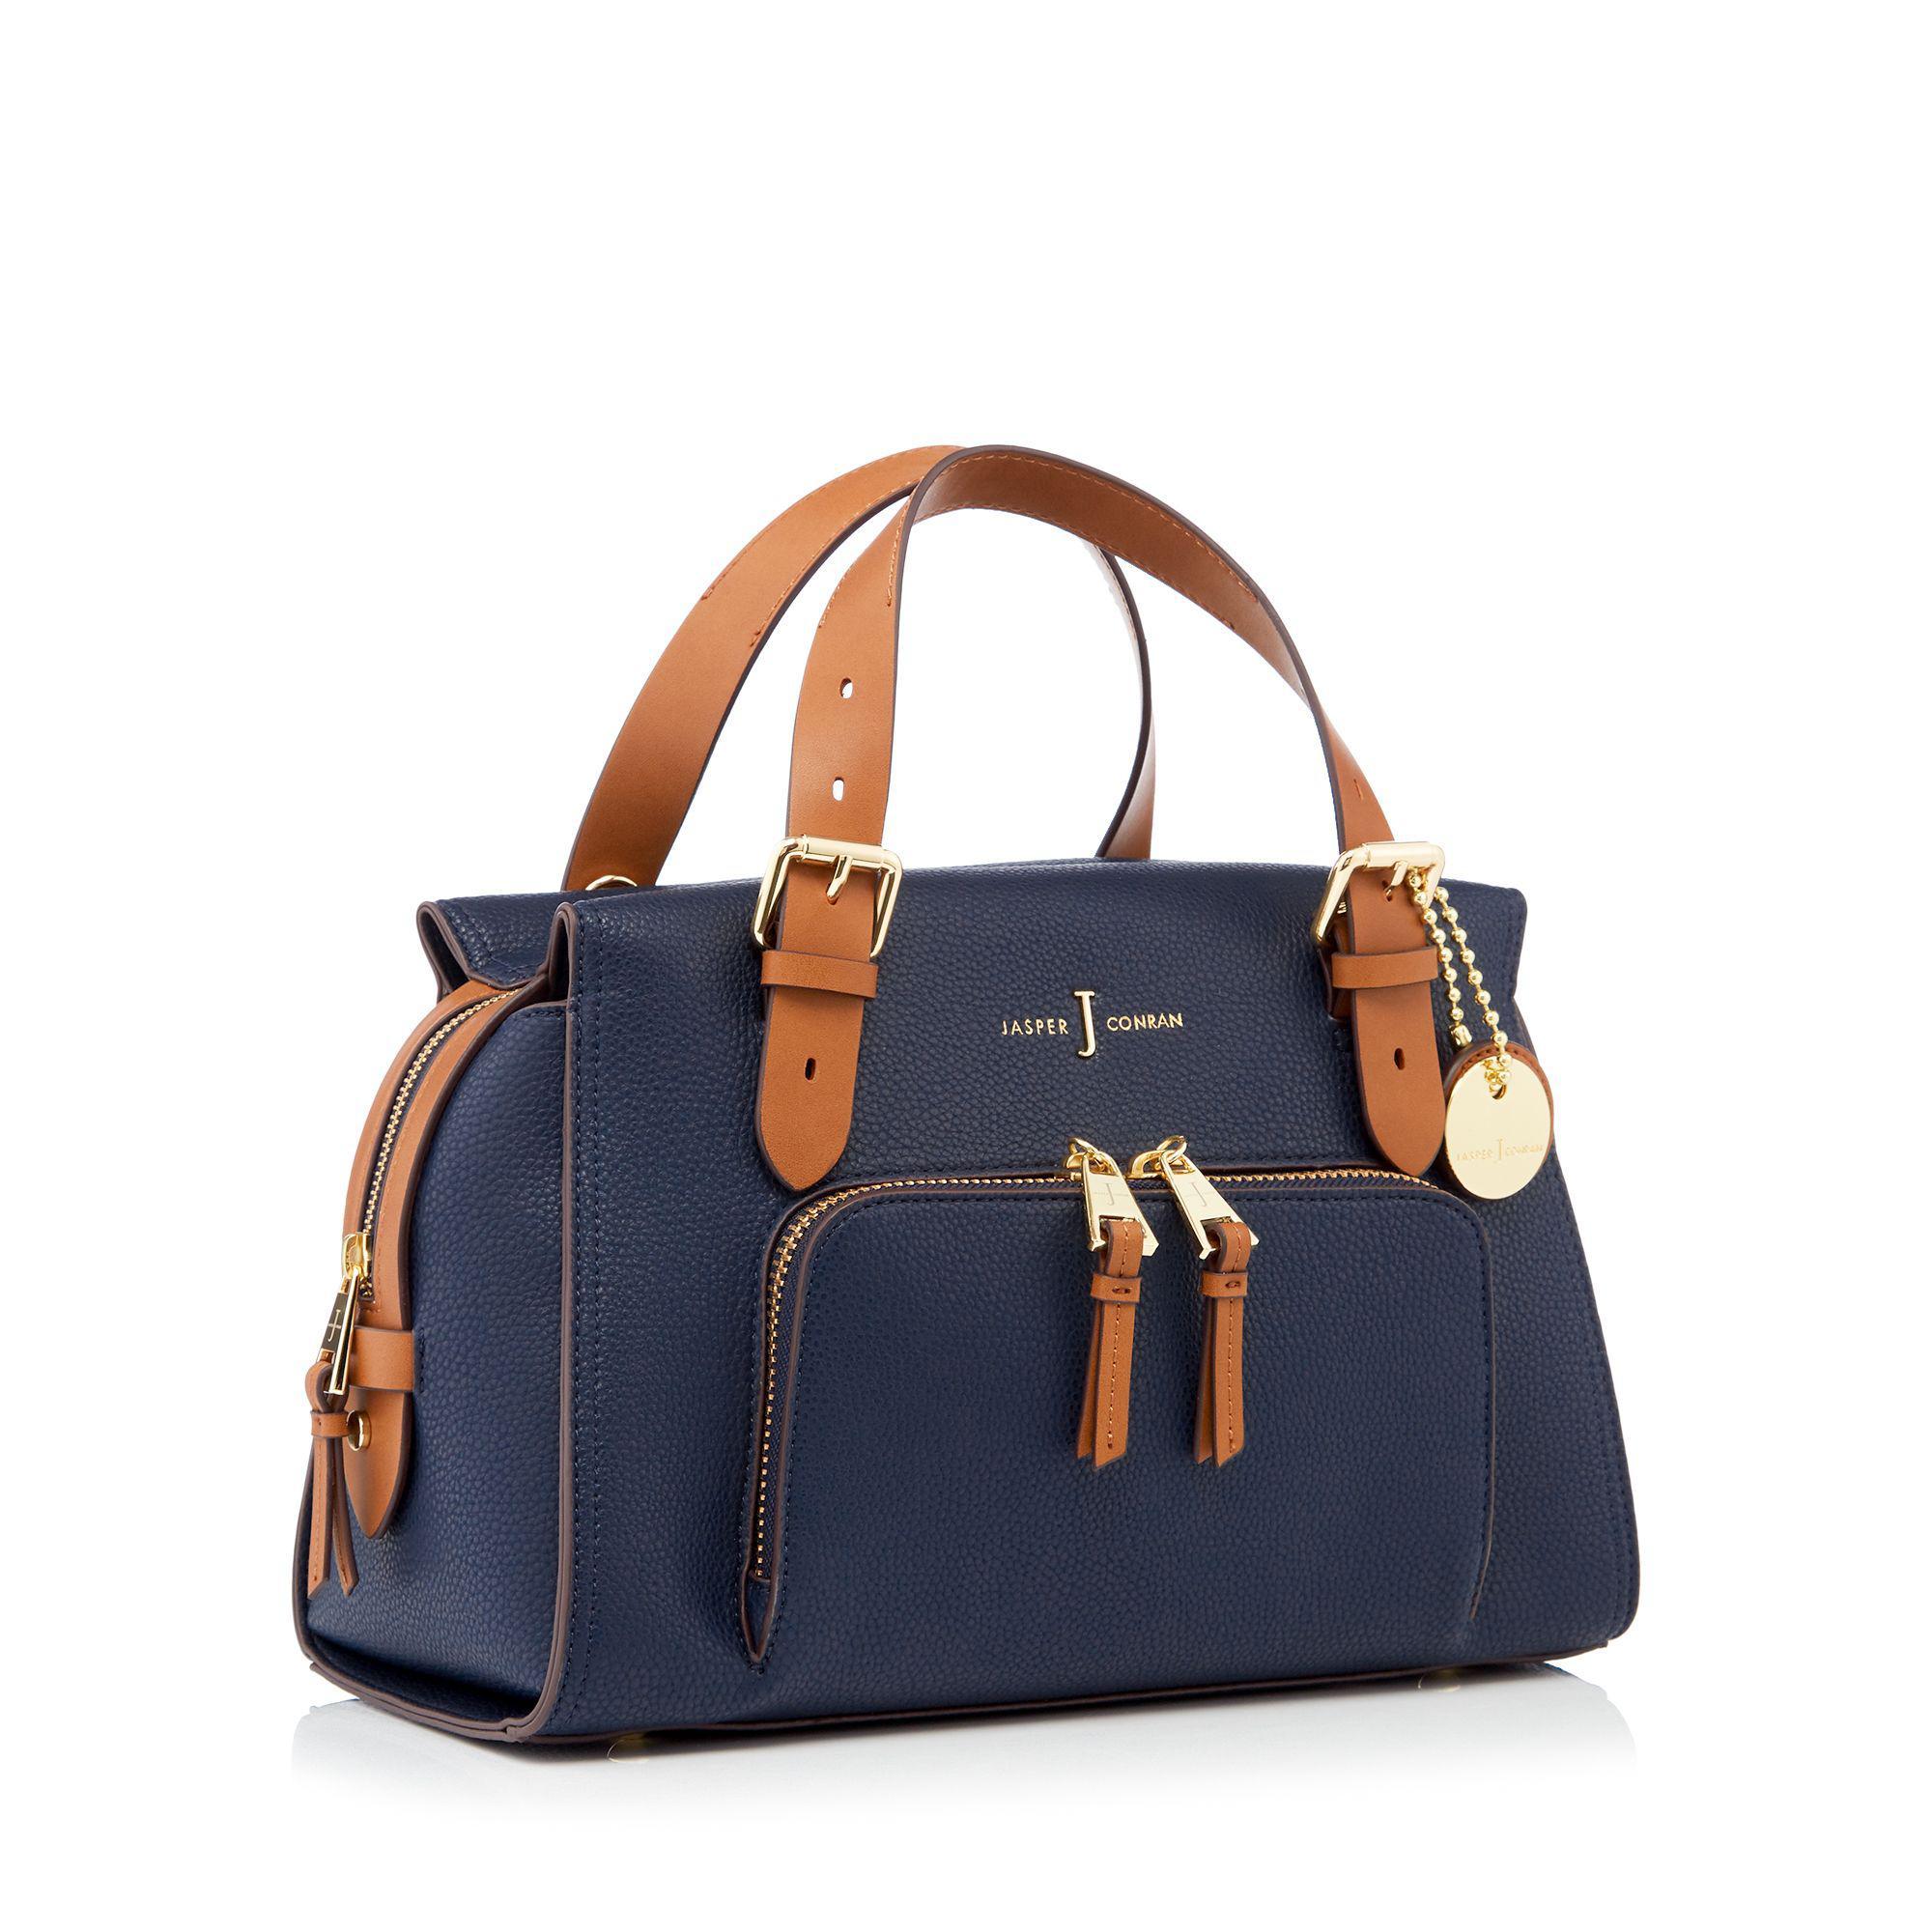 eceb51a48f89 J By Jasper Conran Navy Faux Leather  holland Park  Grab Bag in Blue ...